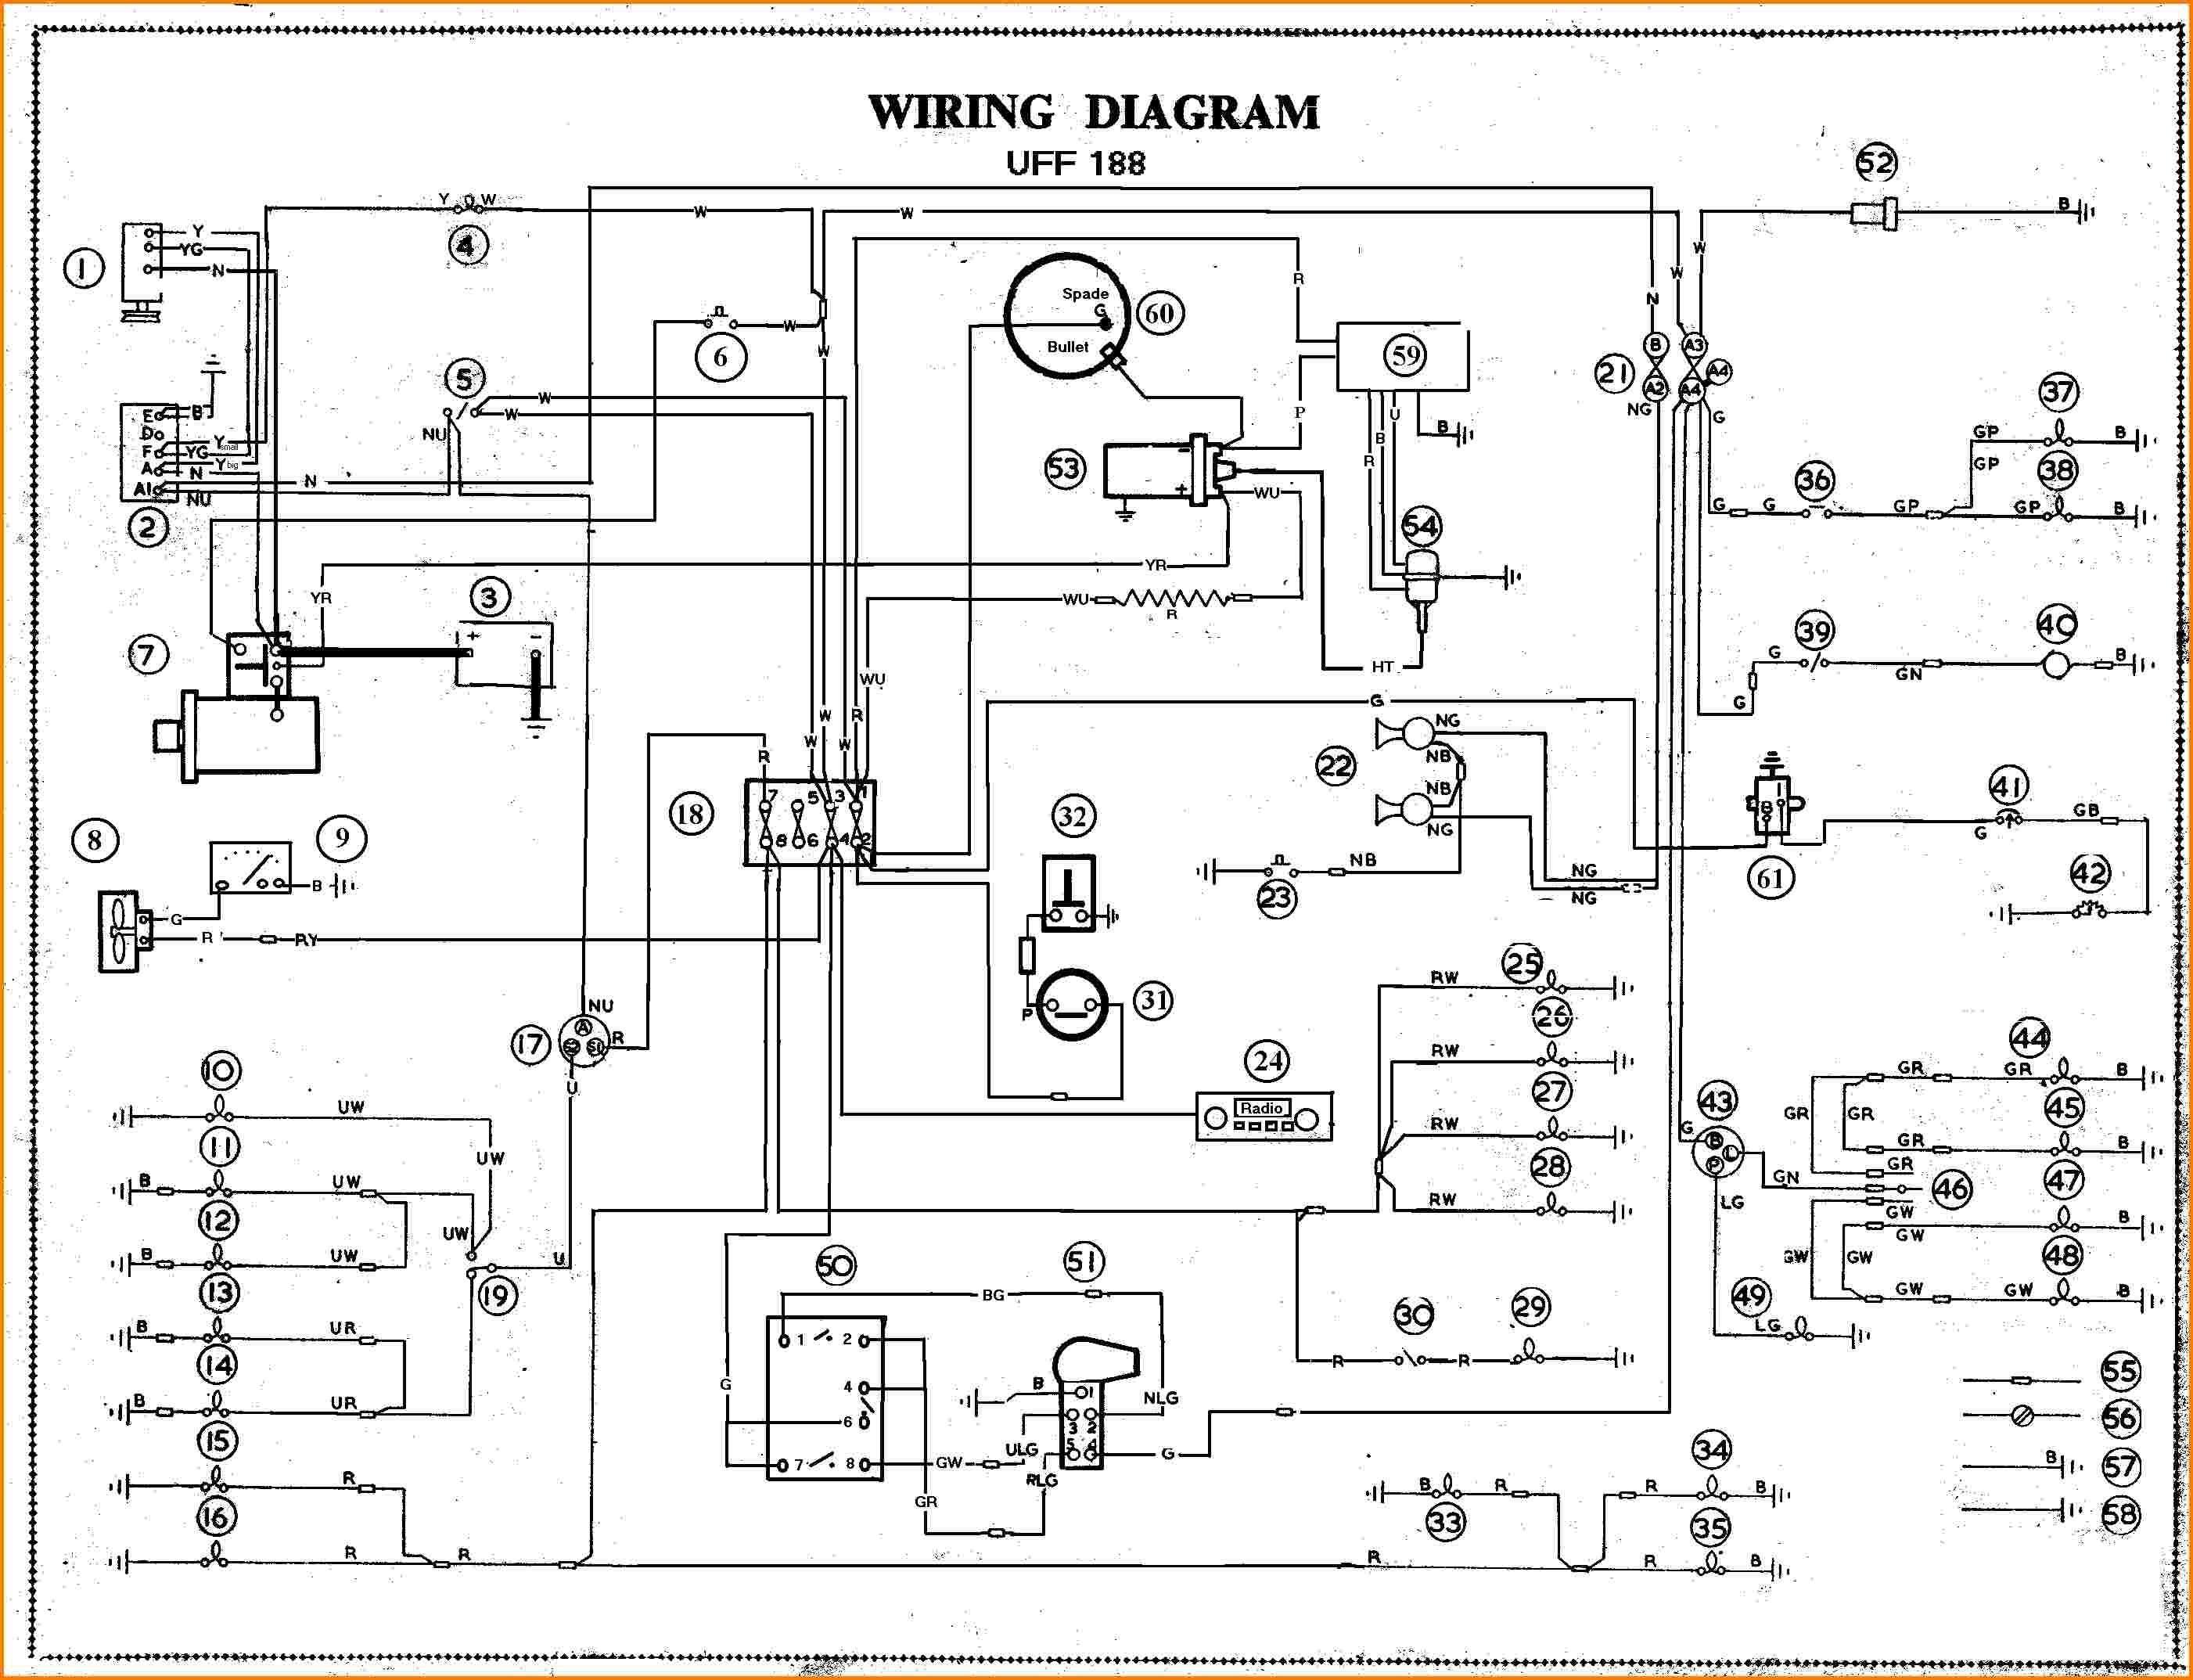 Race Car Switch Panel Wiring Diagram Car Diagram 20 Amazing Race Car Wiring Diagram Ideas 10 Of Race Car Switch Panel Wiring Diagram